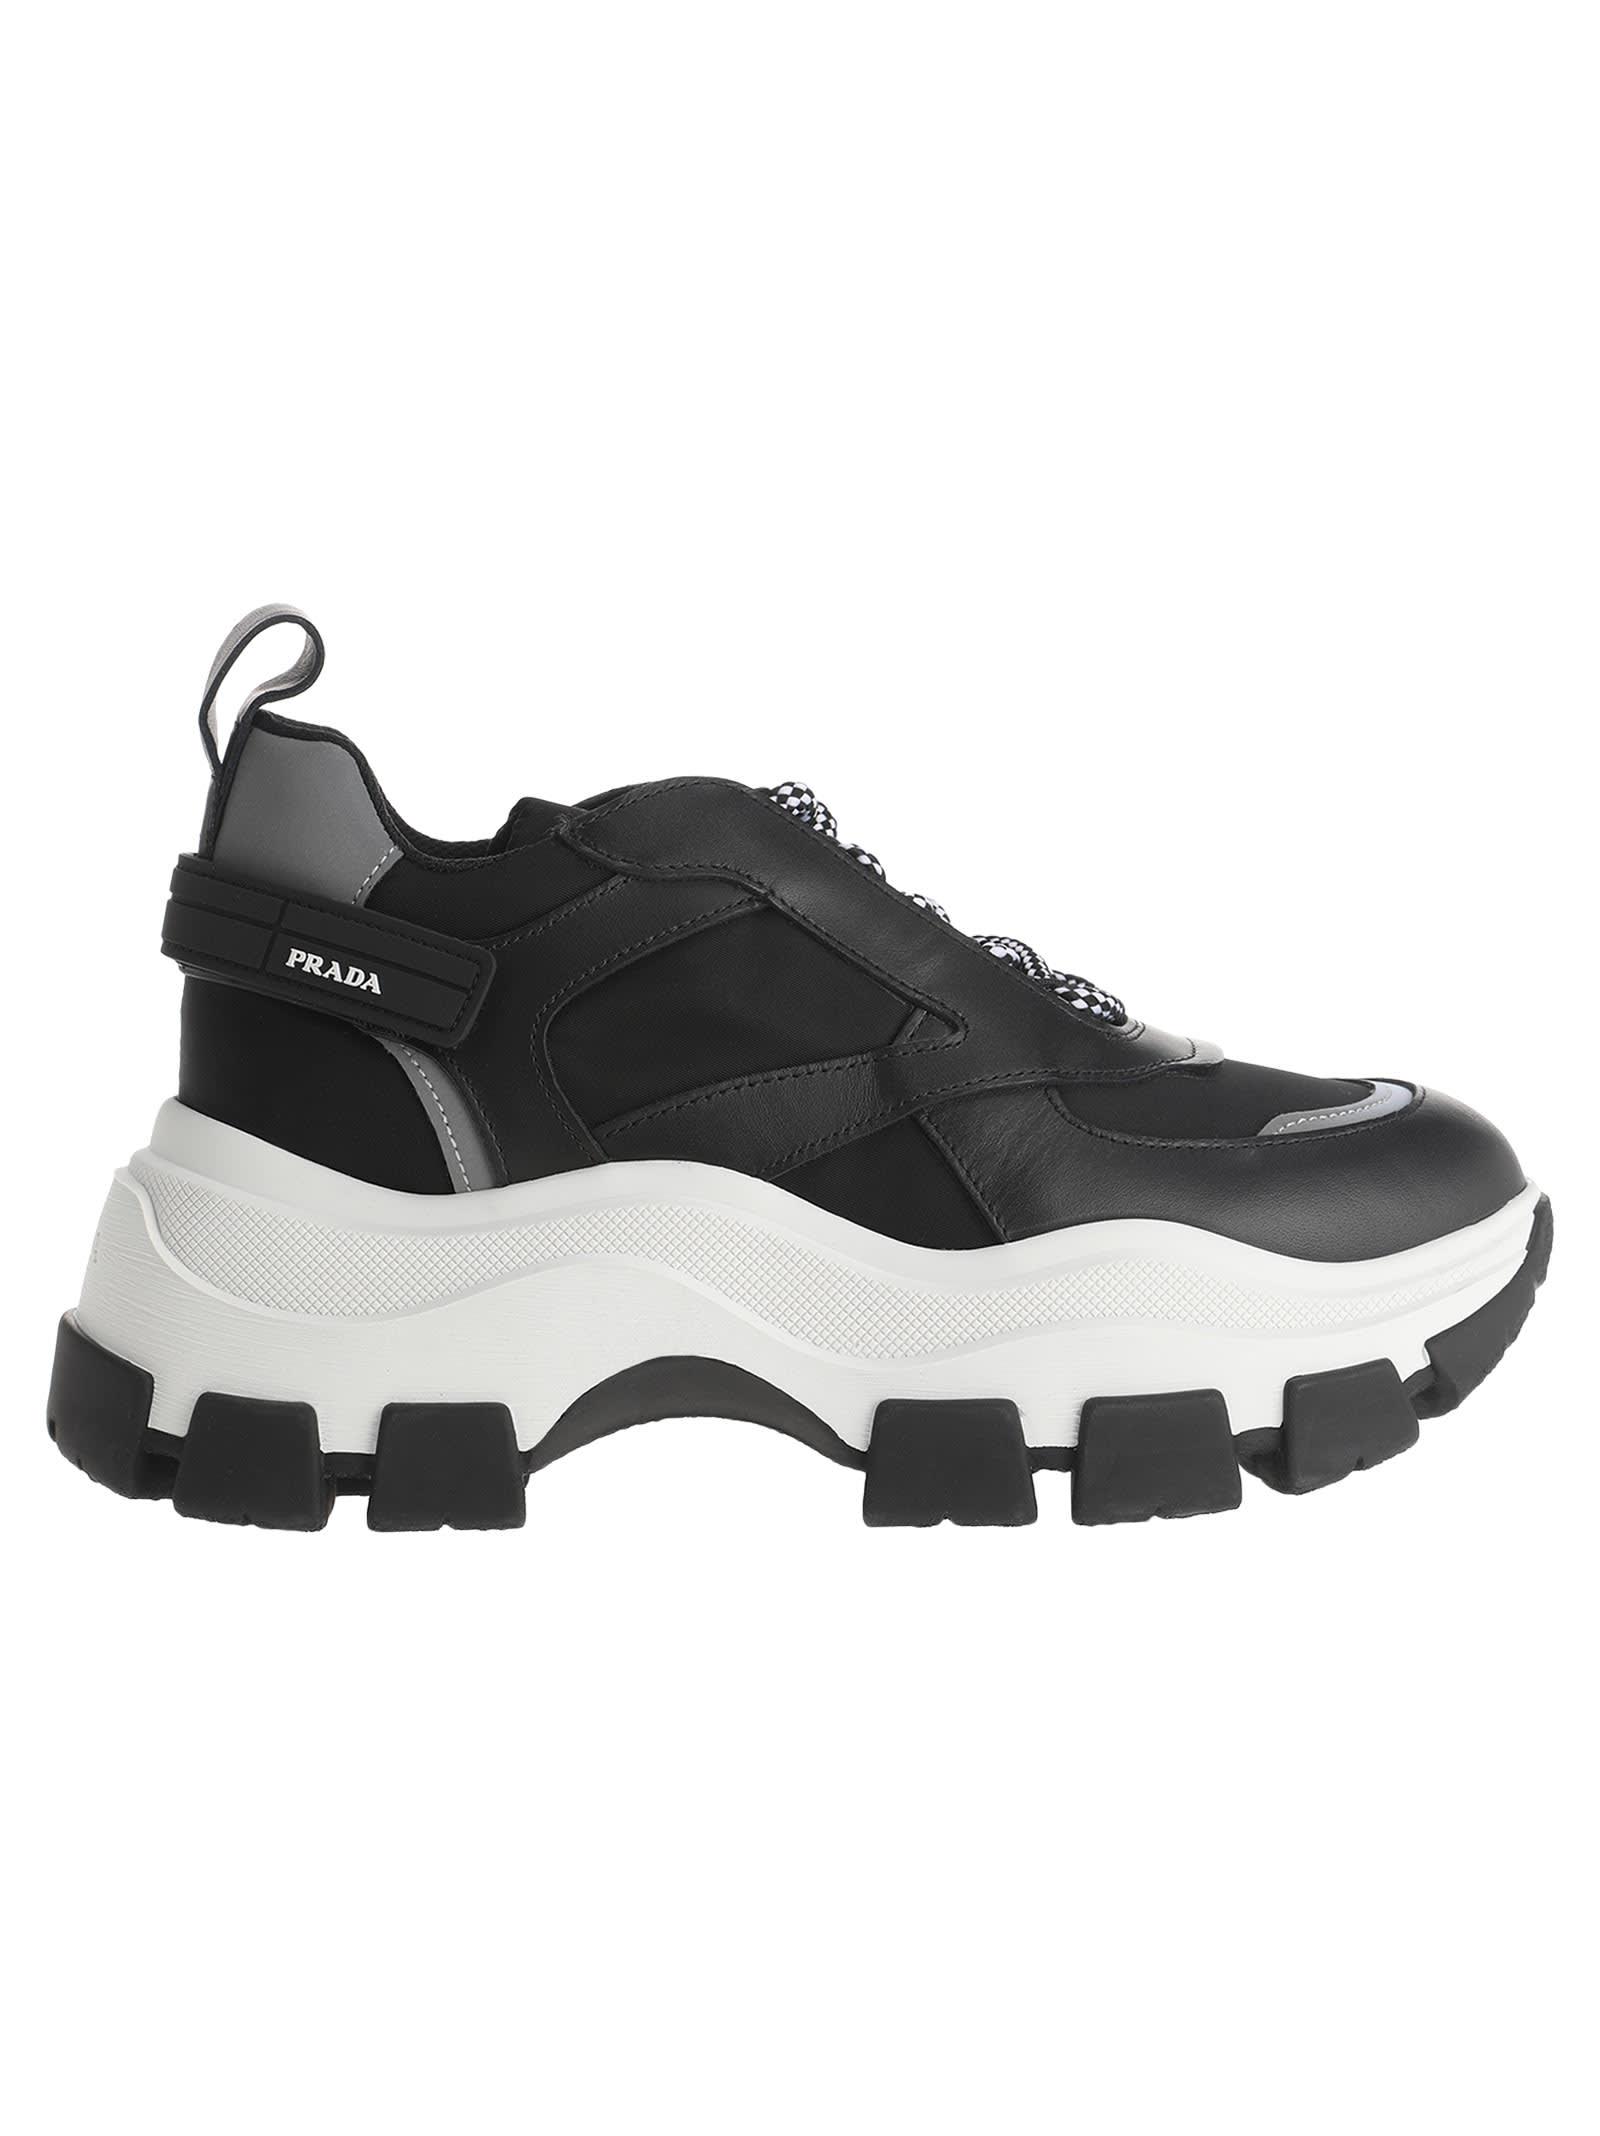 ae69a42cb Prada Prada Chunky Sole Sneakers - BLACK - 10994260   italist